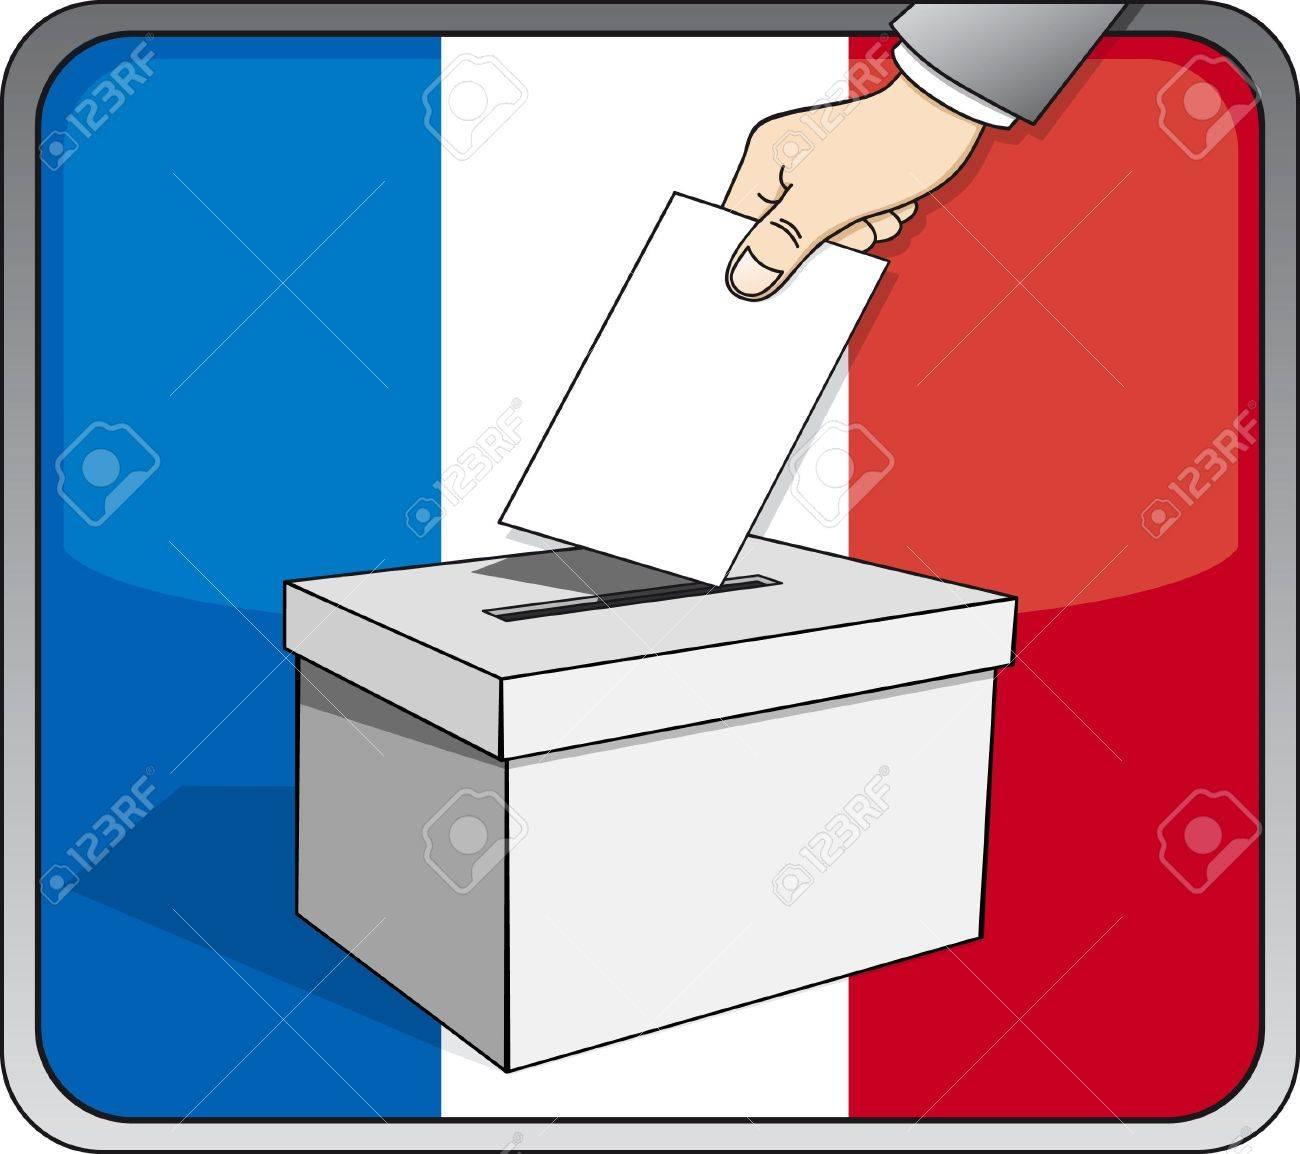 French elections - ballot box Stock Vector - 17336419